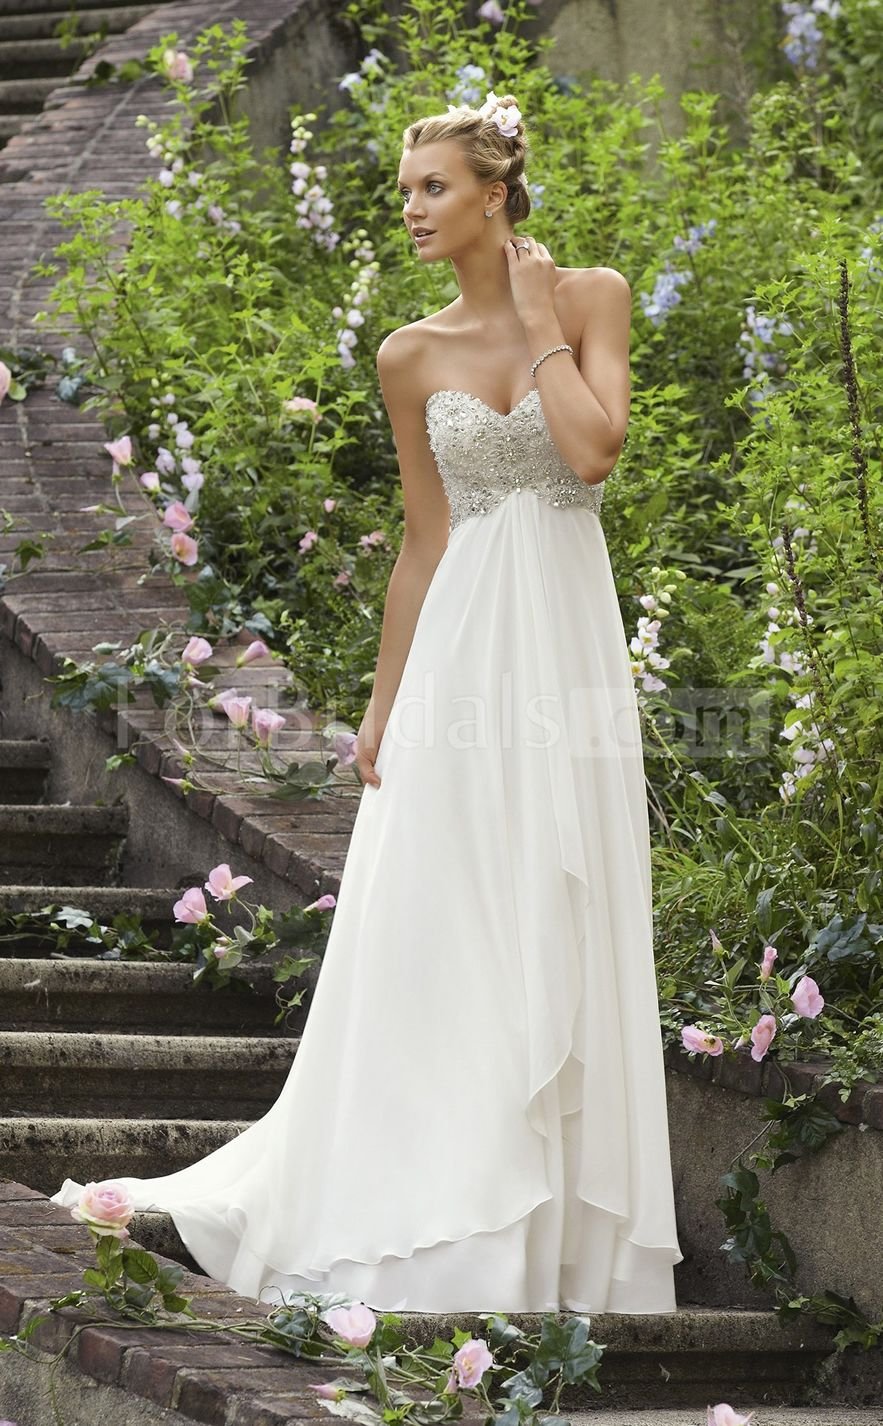 White and blue wedding dresses  Aline Chiffon Beach Empire Waist Wedding Dresses  One Day uc